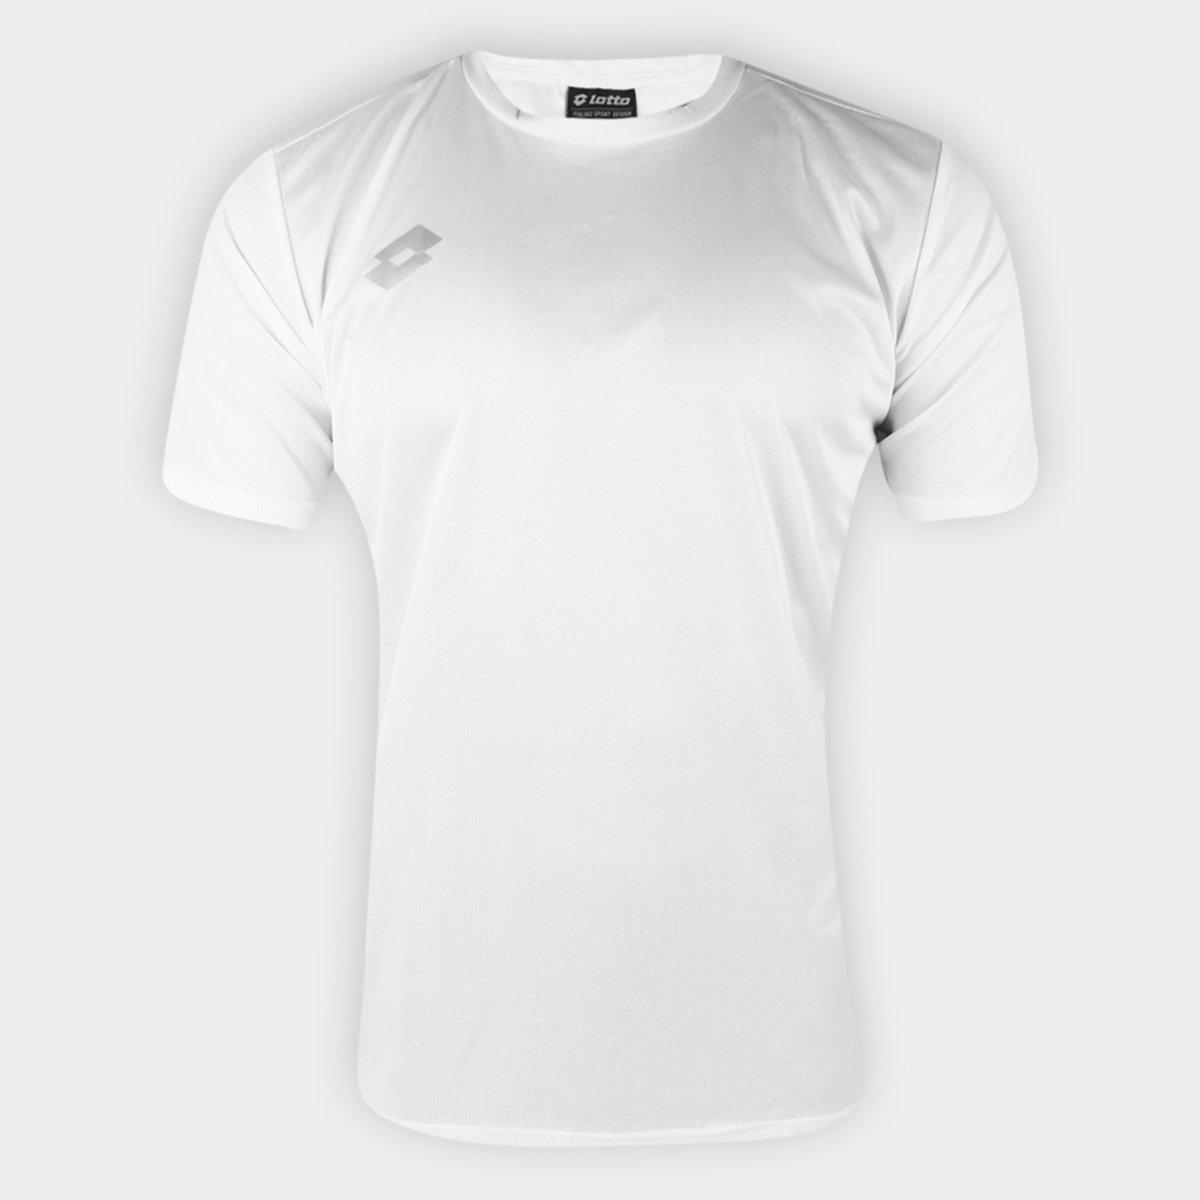 Camisa Futebol Lotto Andreoli Masculina